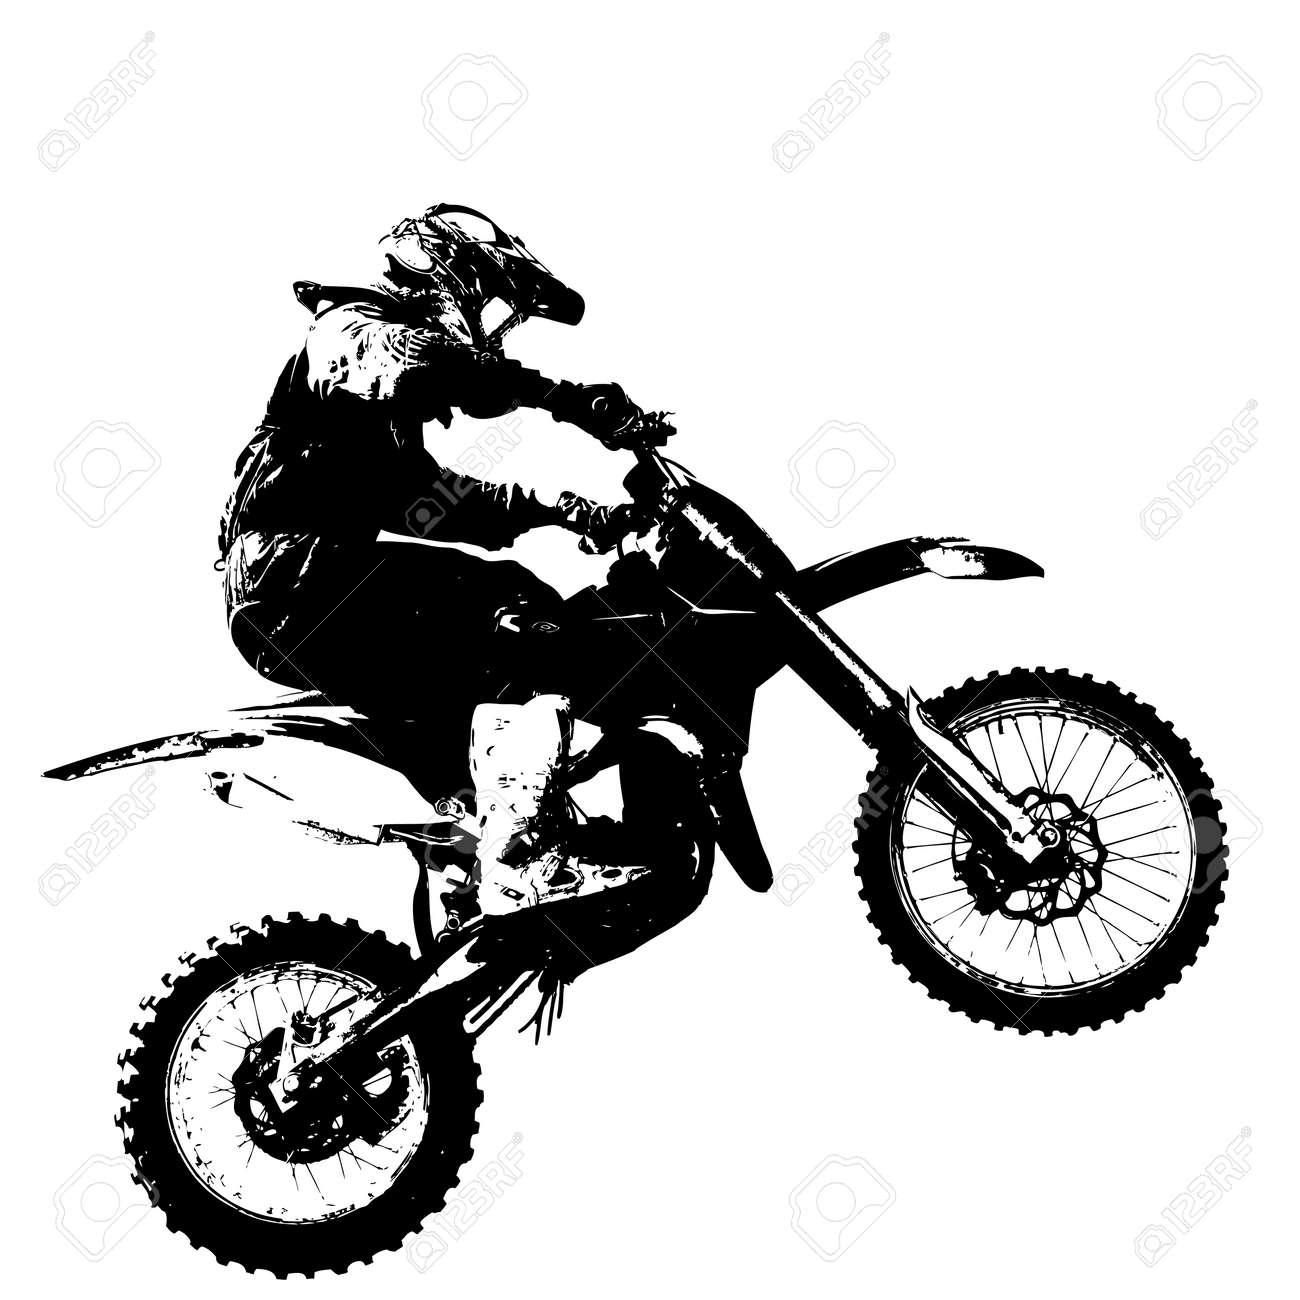 Rider participates motocross championship. Vector illustration. - 39162356